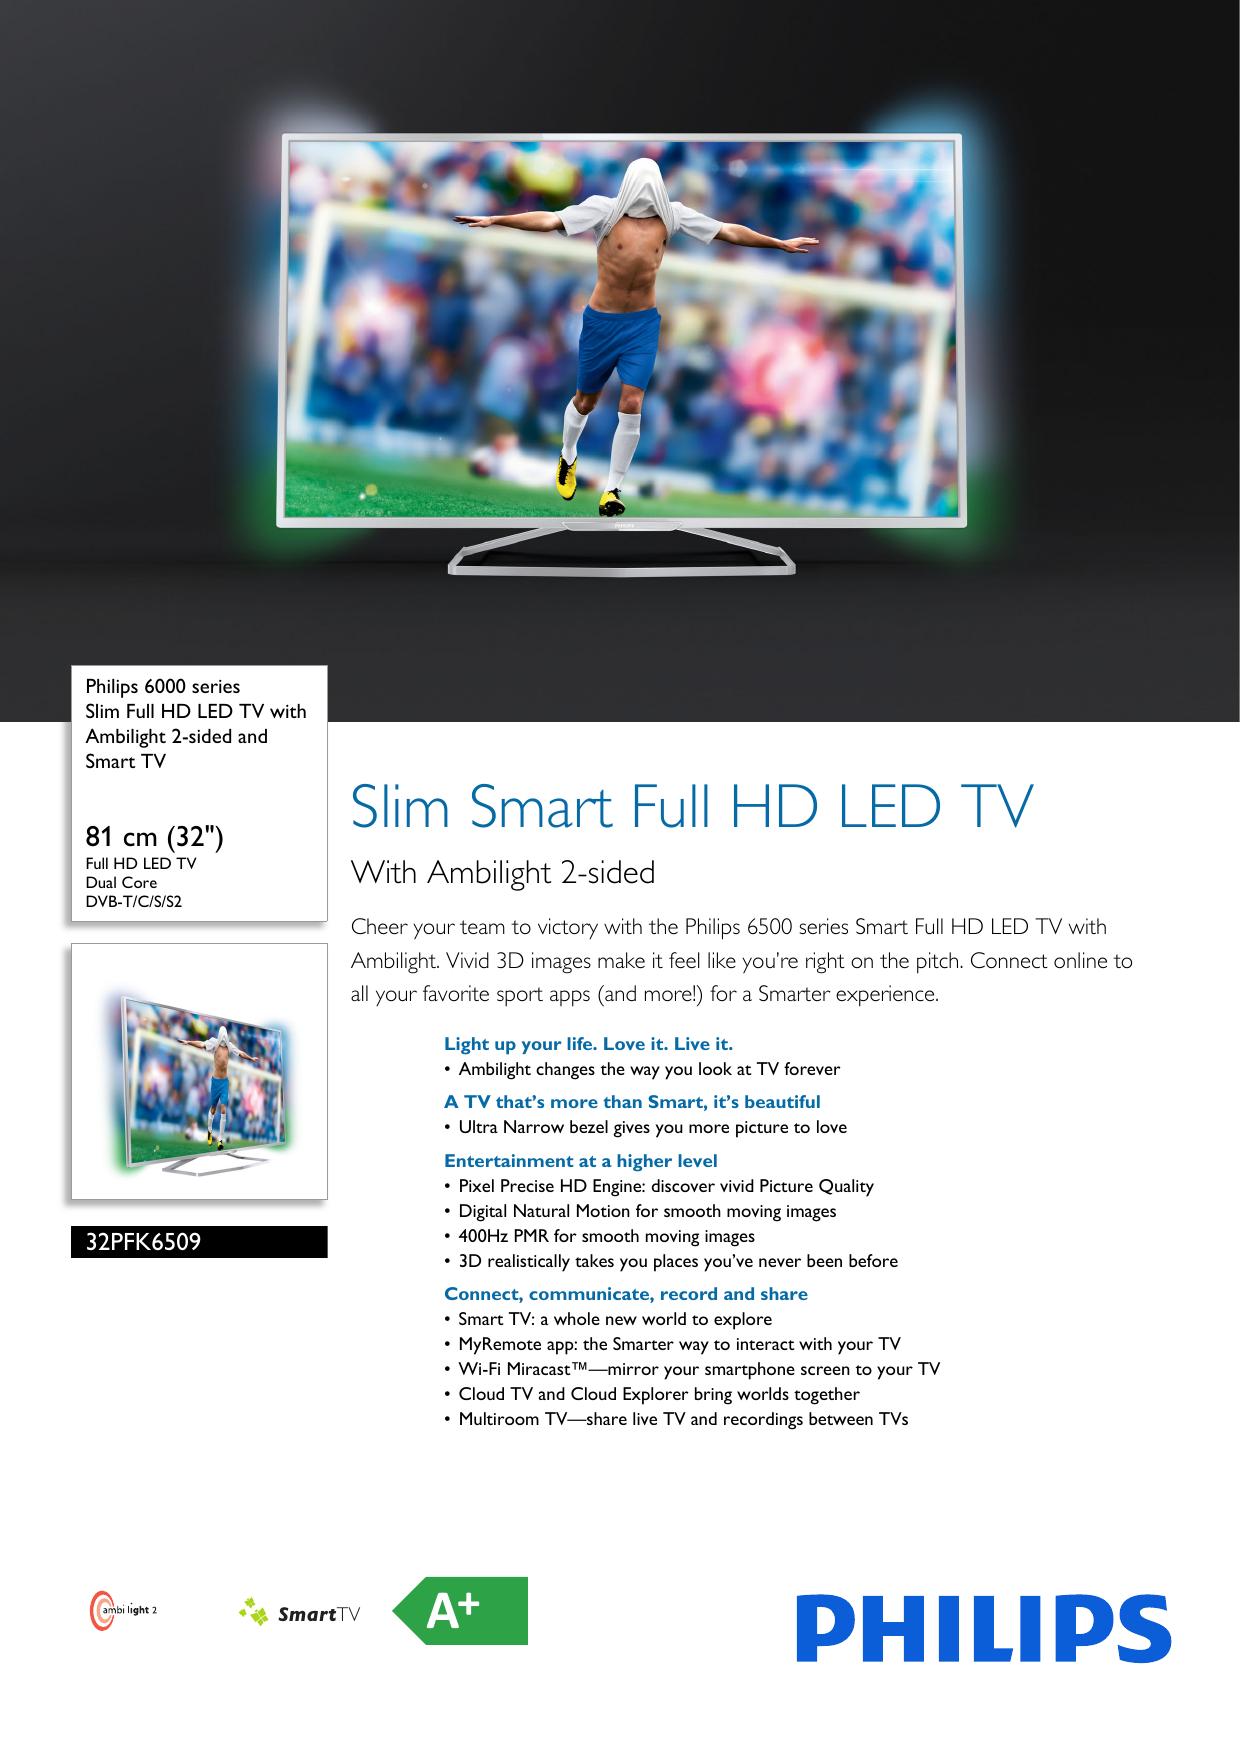 32PFK6509/12 Philips Slim Full HD LED TV with | manualzz com